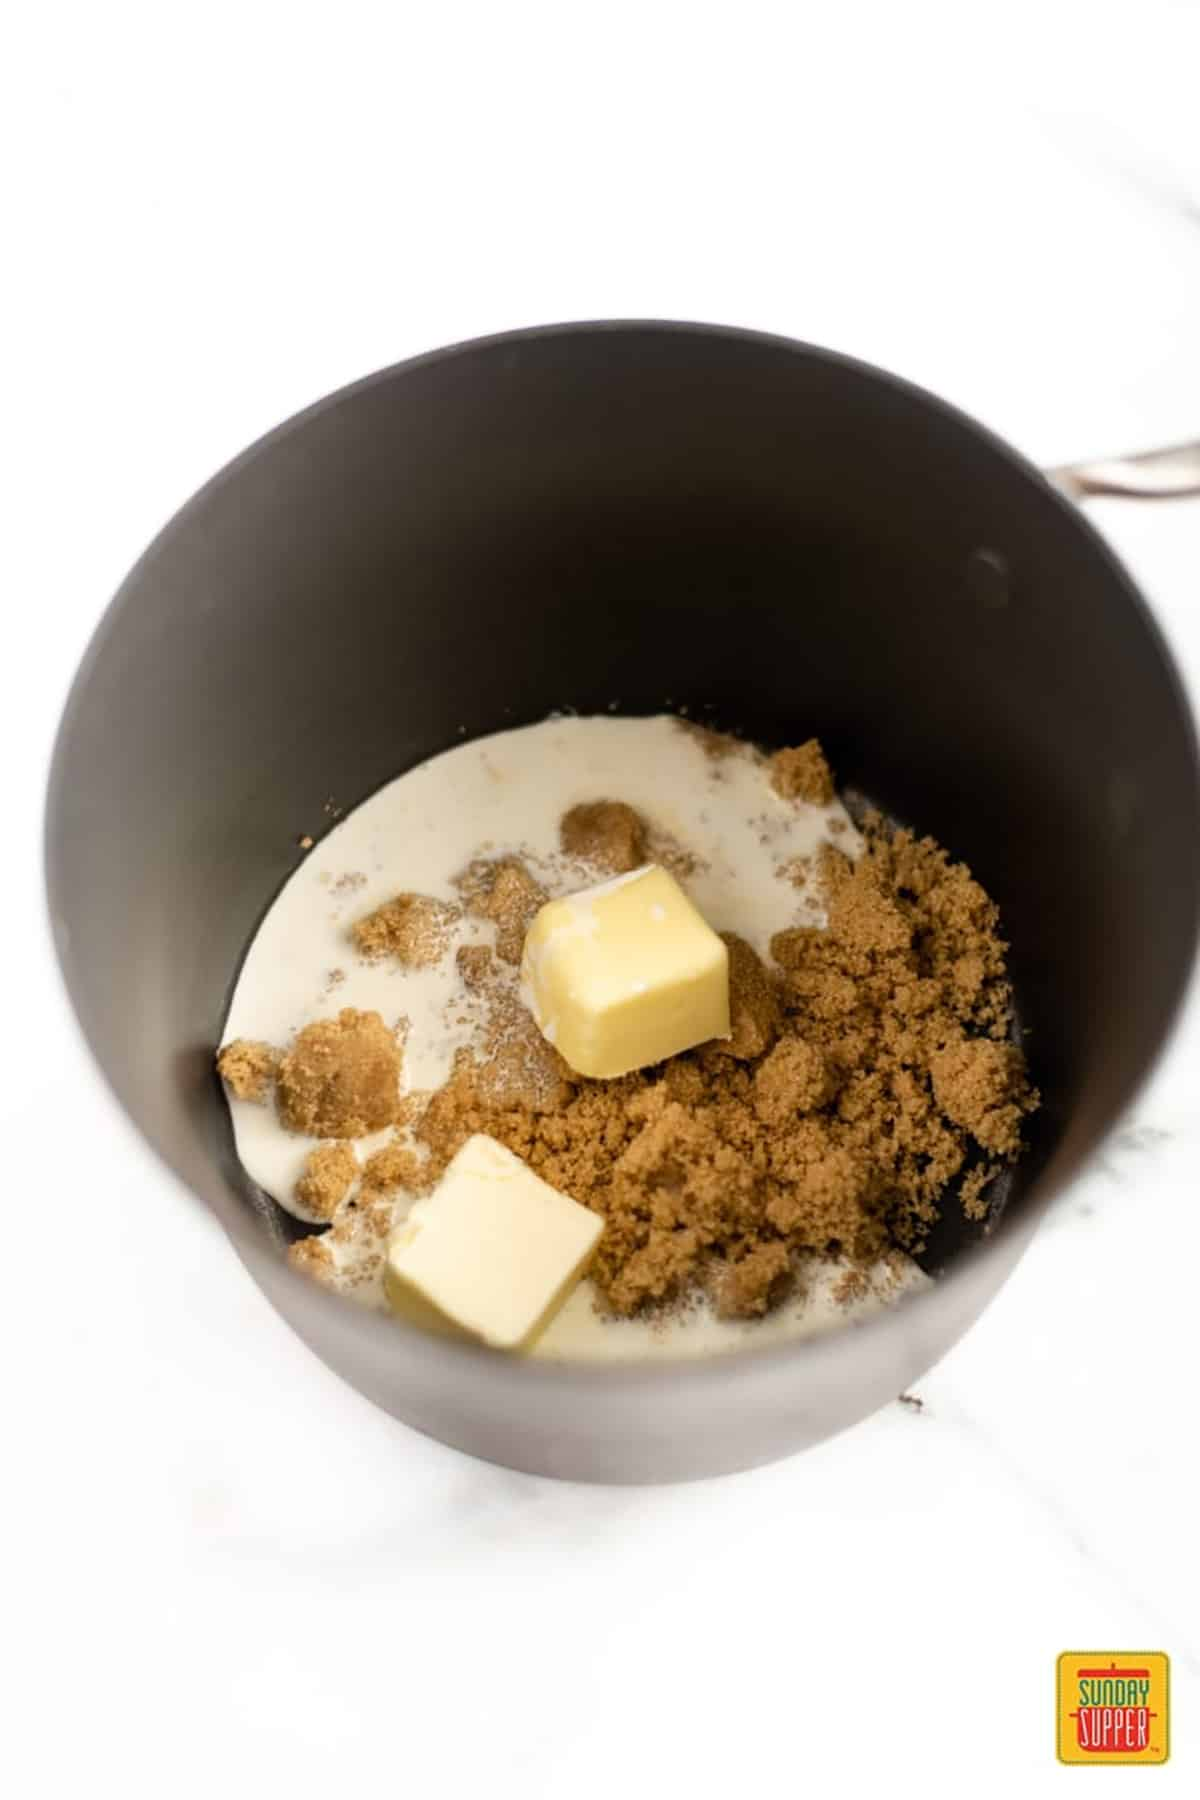 butterscotch sauce recipe ingredients in a deep pot